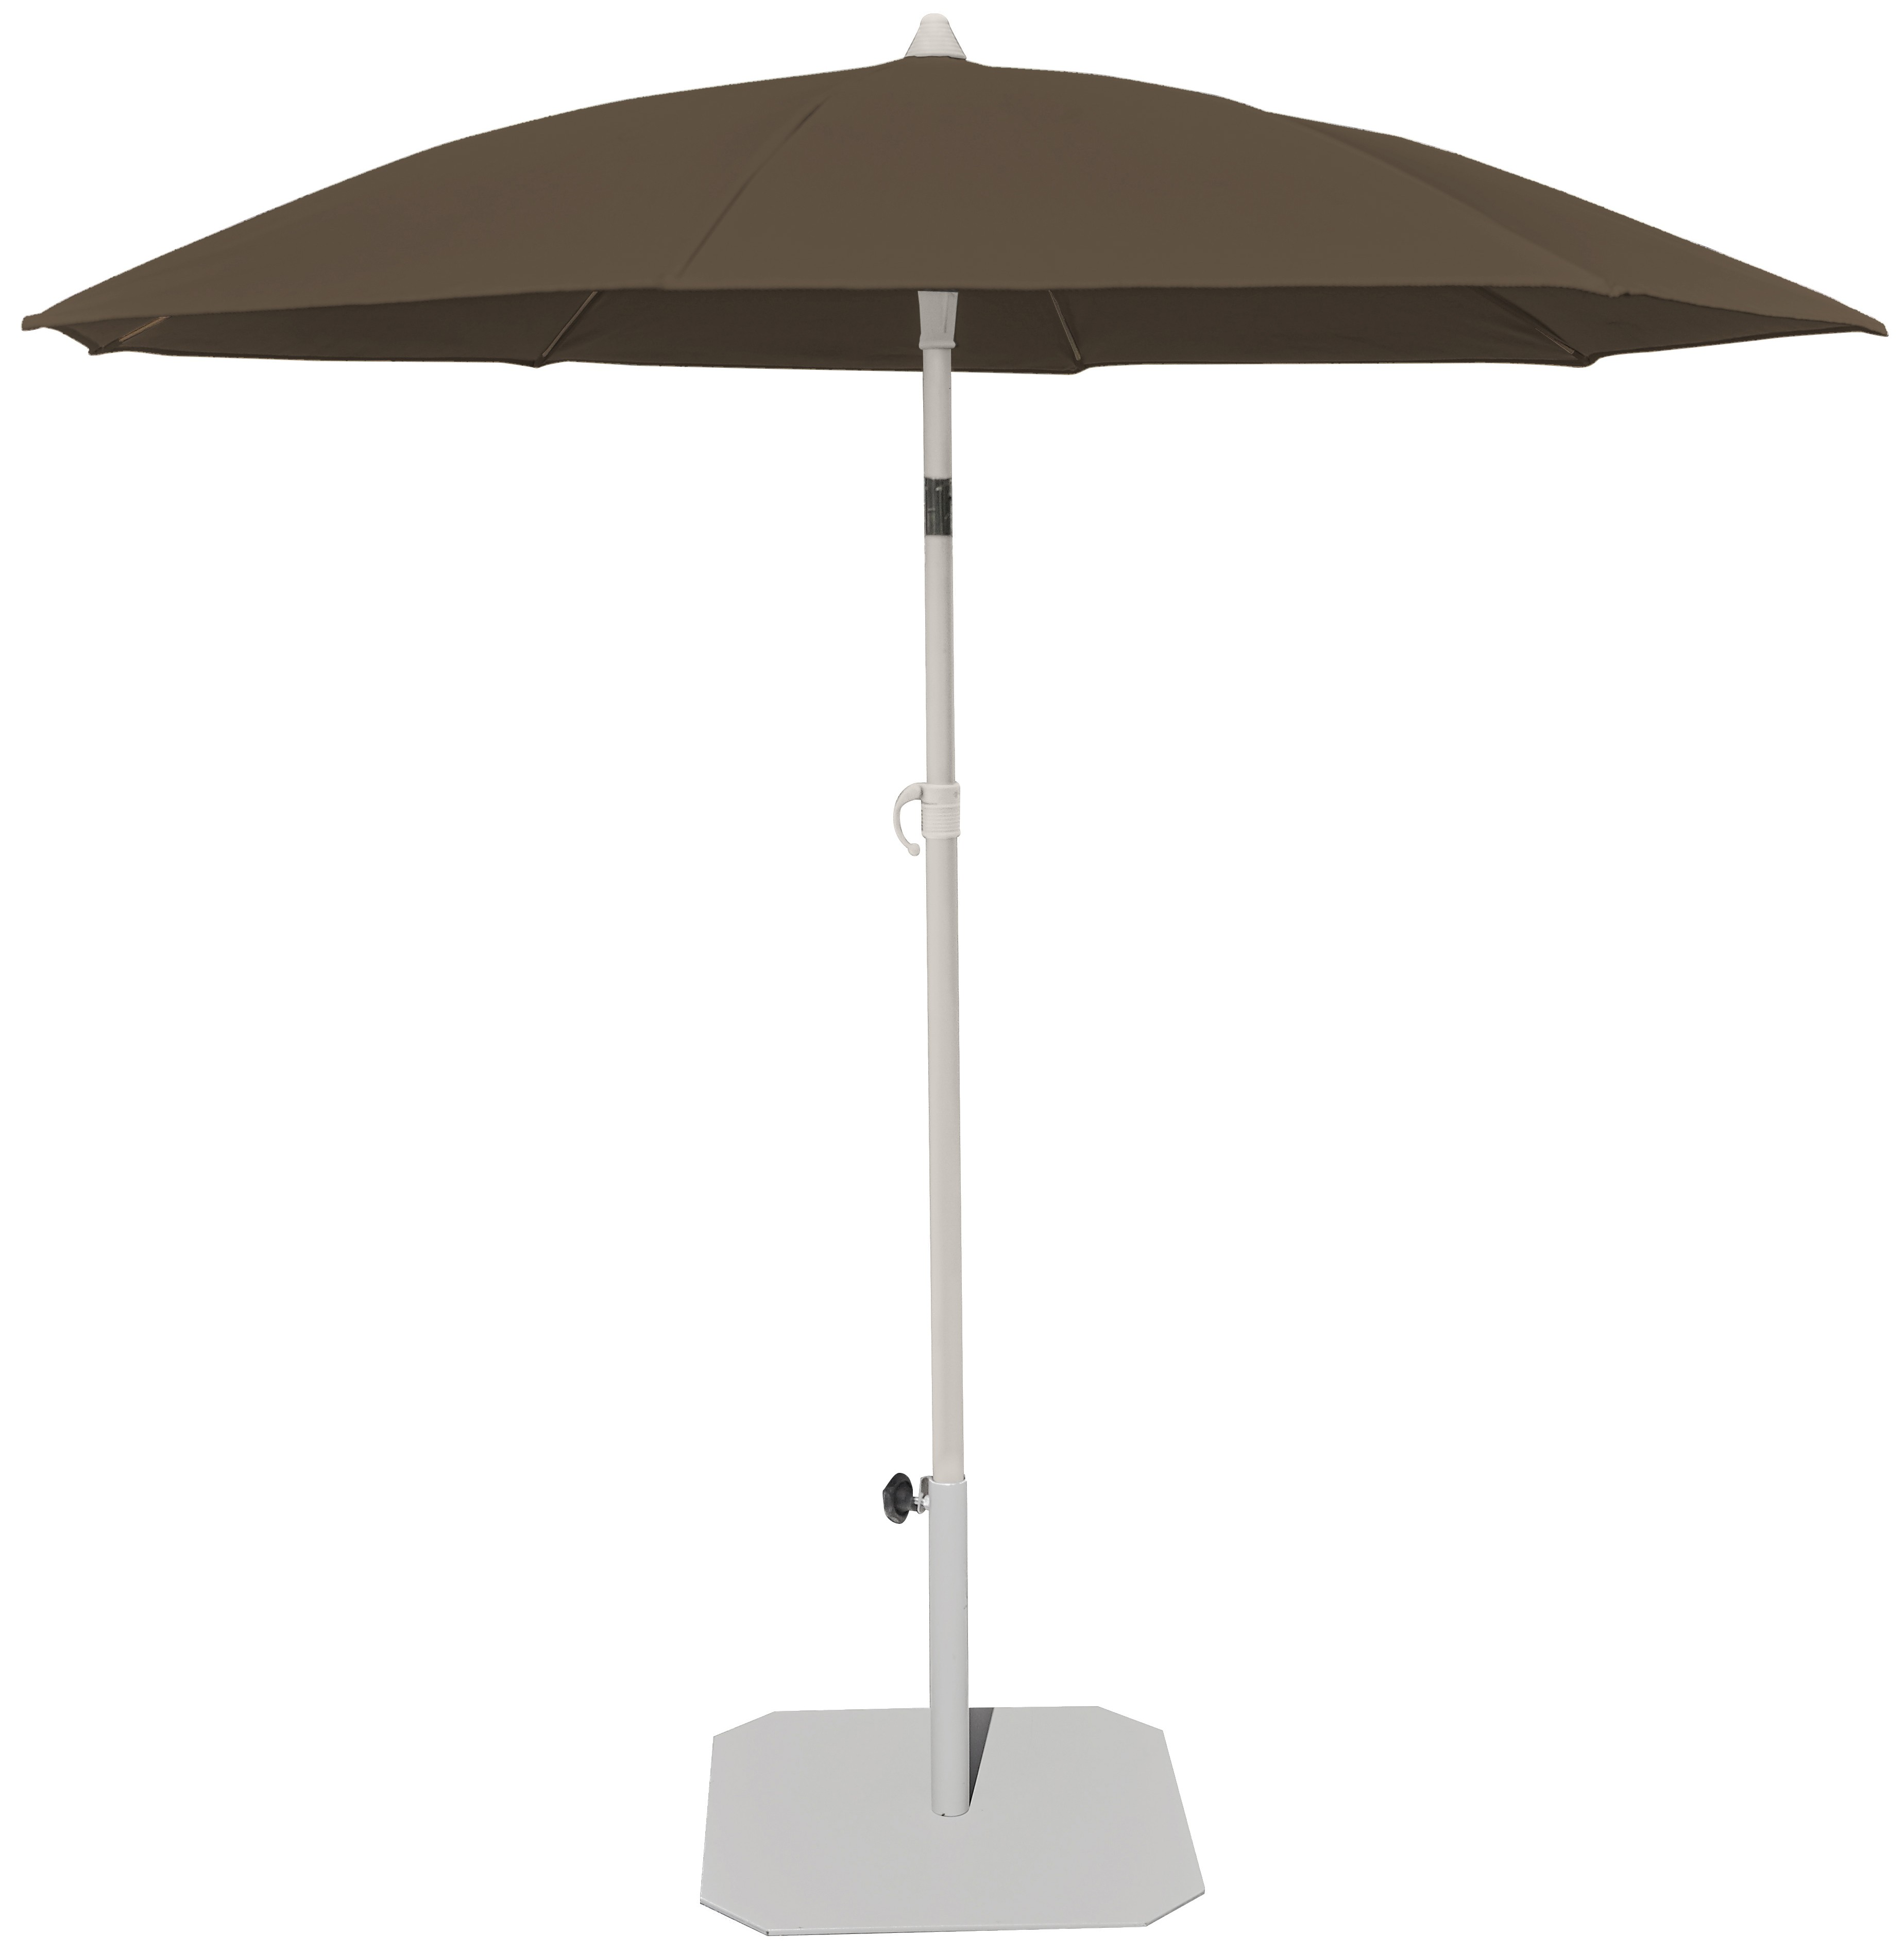 Parasol Ezpeleta Redondos Sand 0 Blancos moka Olefin 2